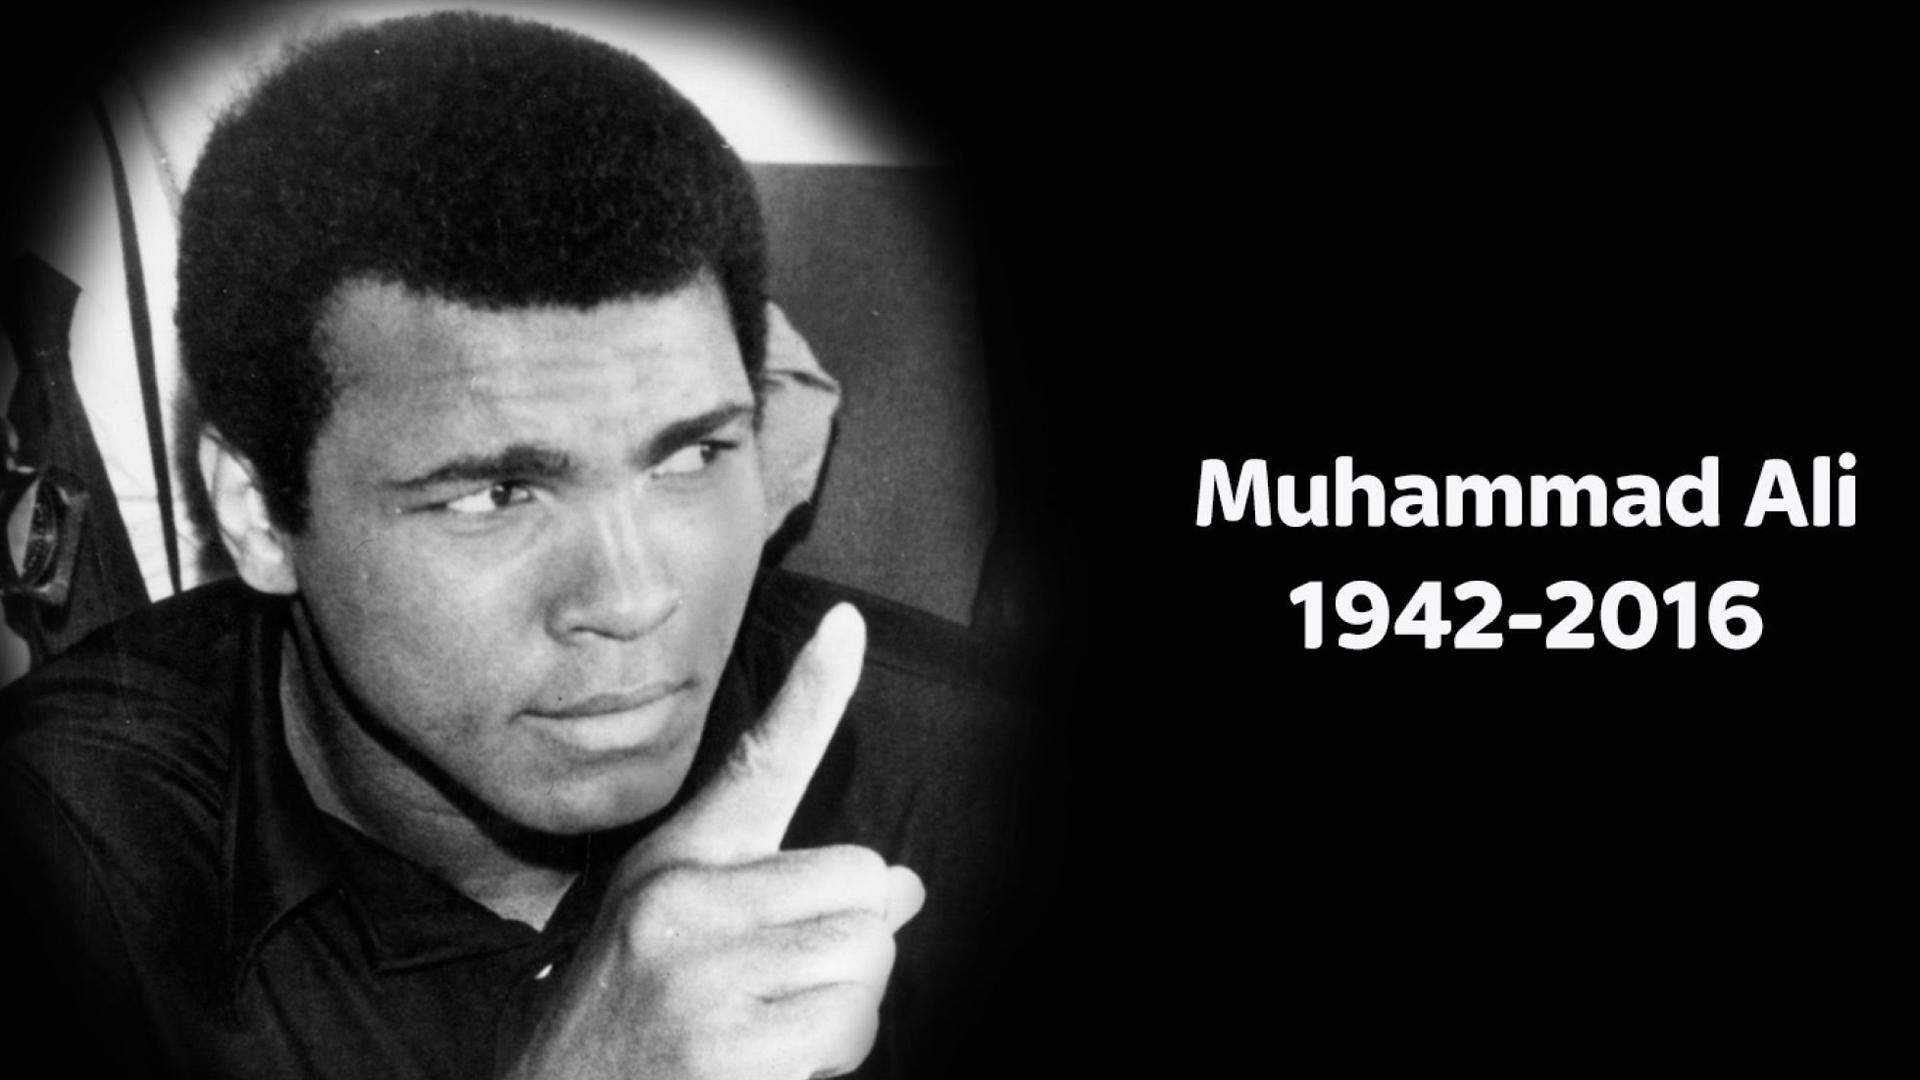 Muhammad ali death date in Brisbane